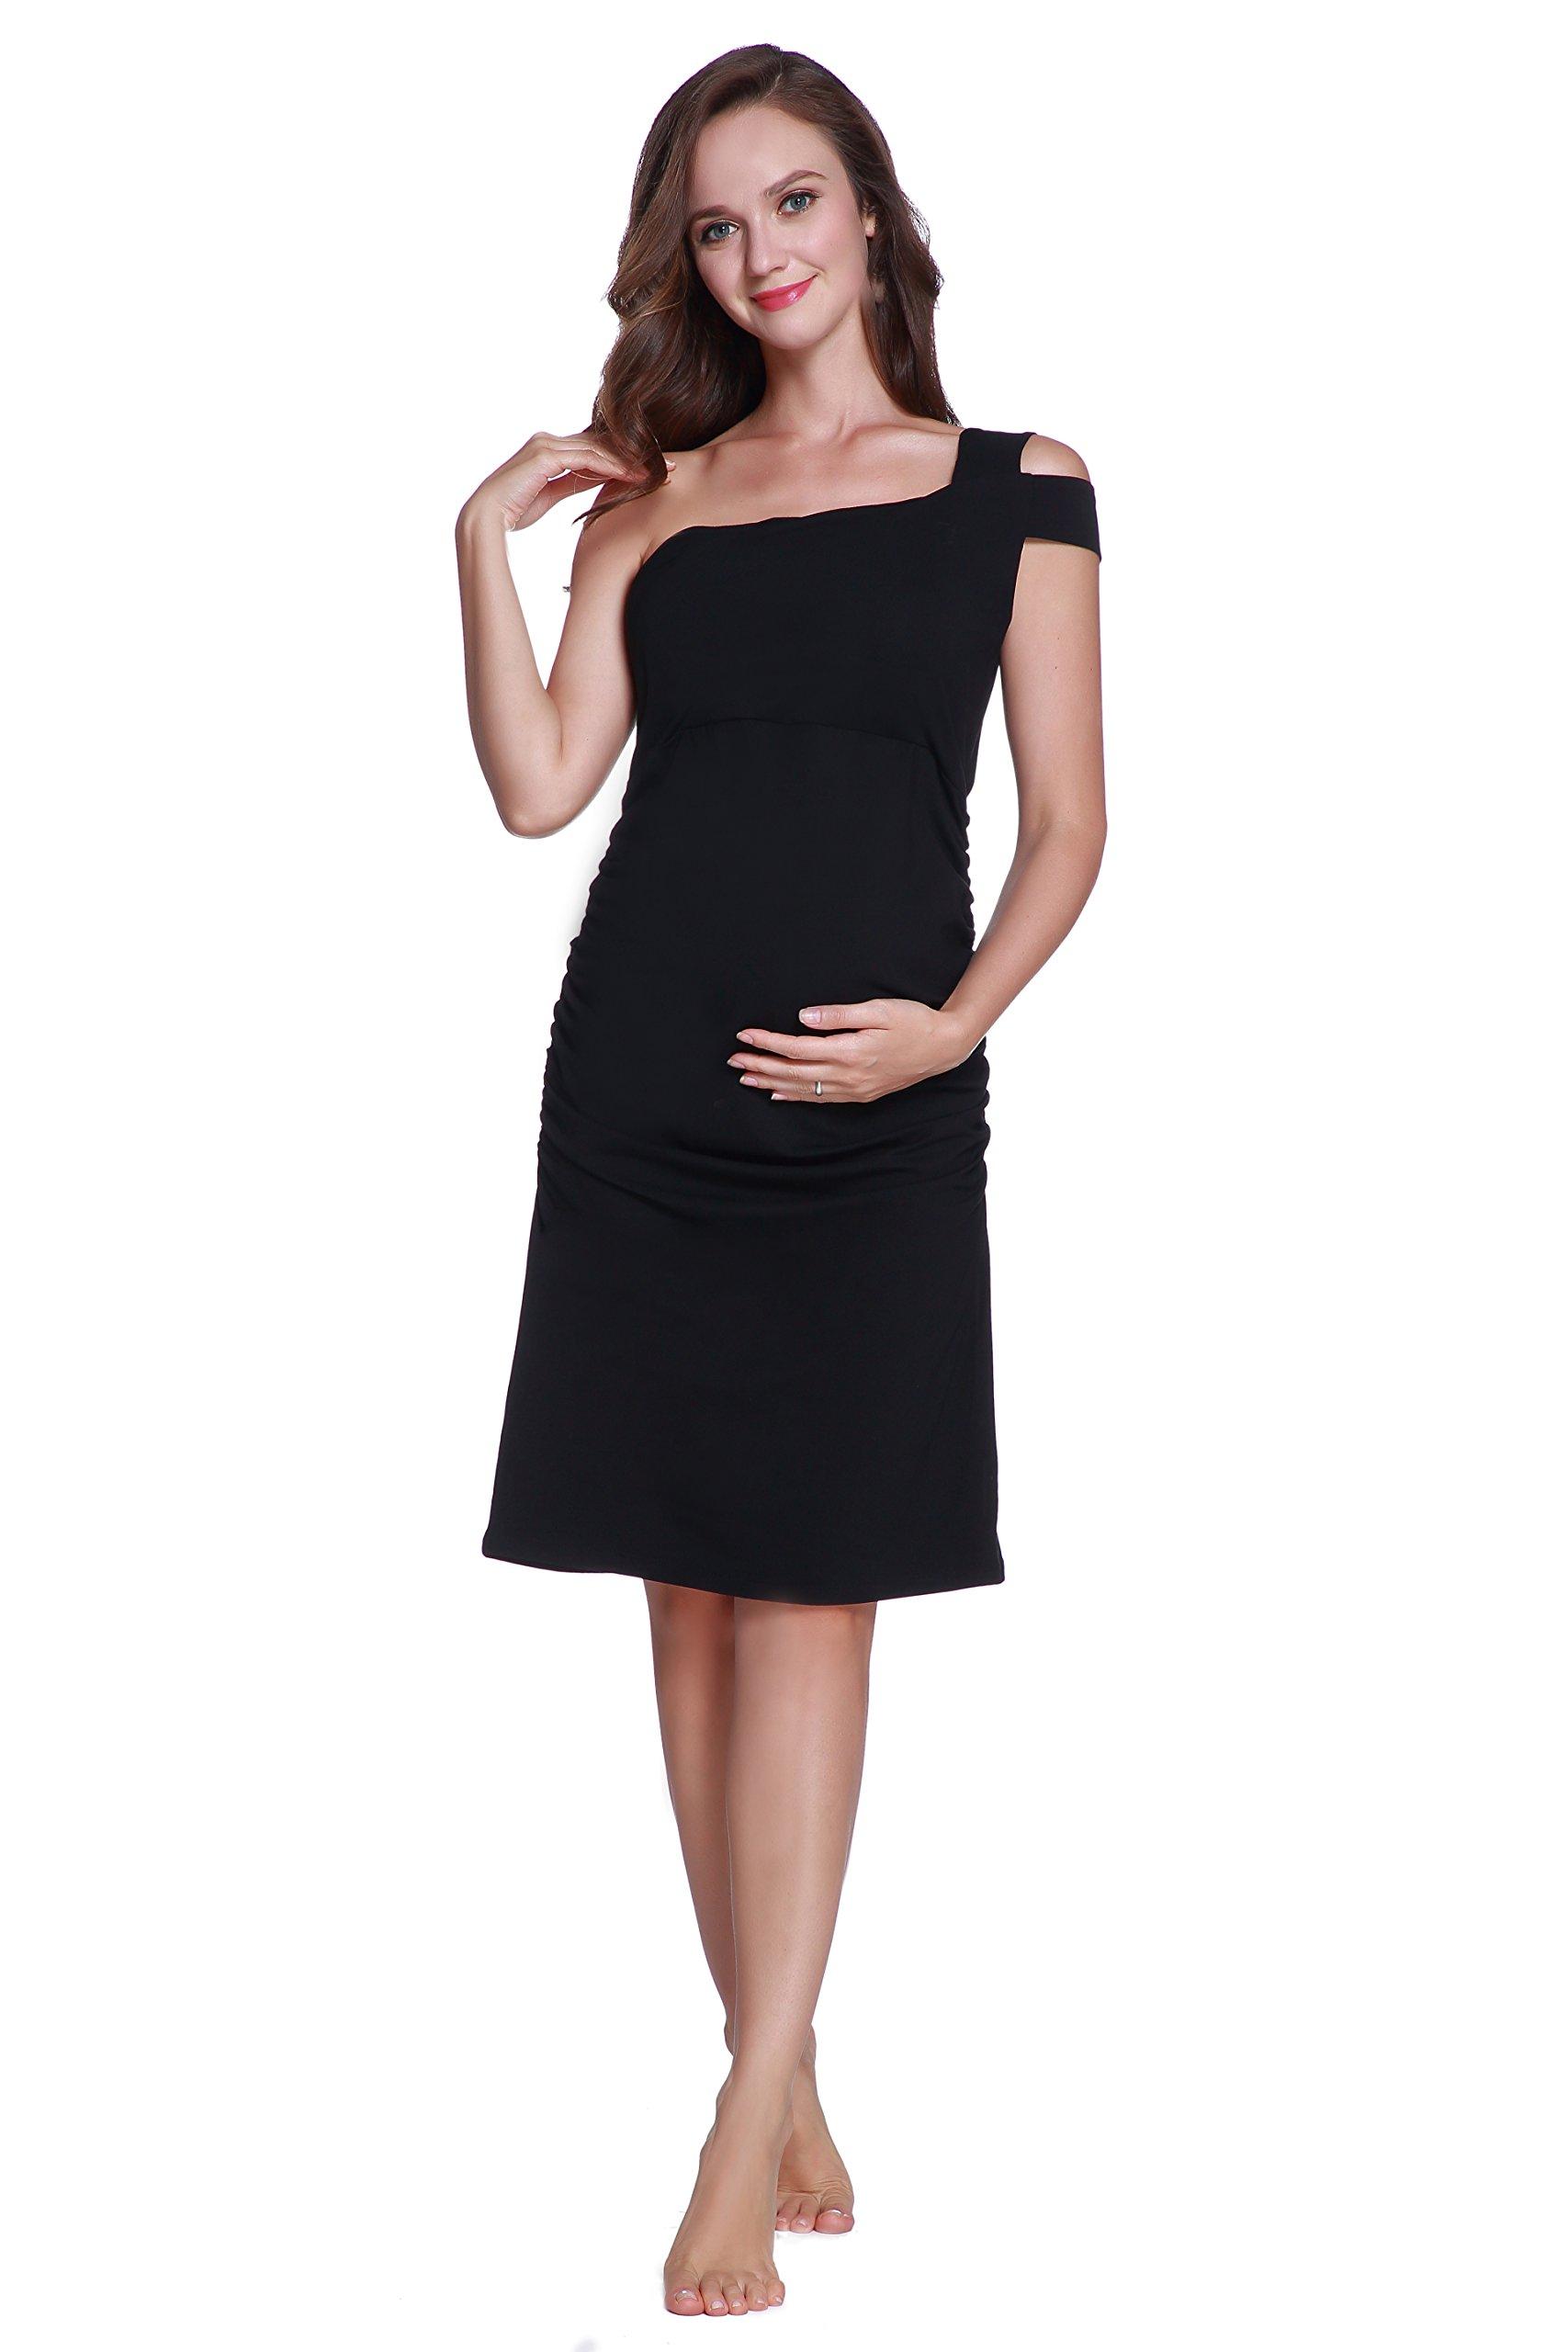 Betteri Women's Sexy Cold Shoulder Black Bodycon Dresses - Maternity Dress Formal - Baby Shower Dress